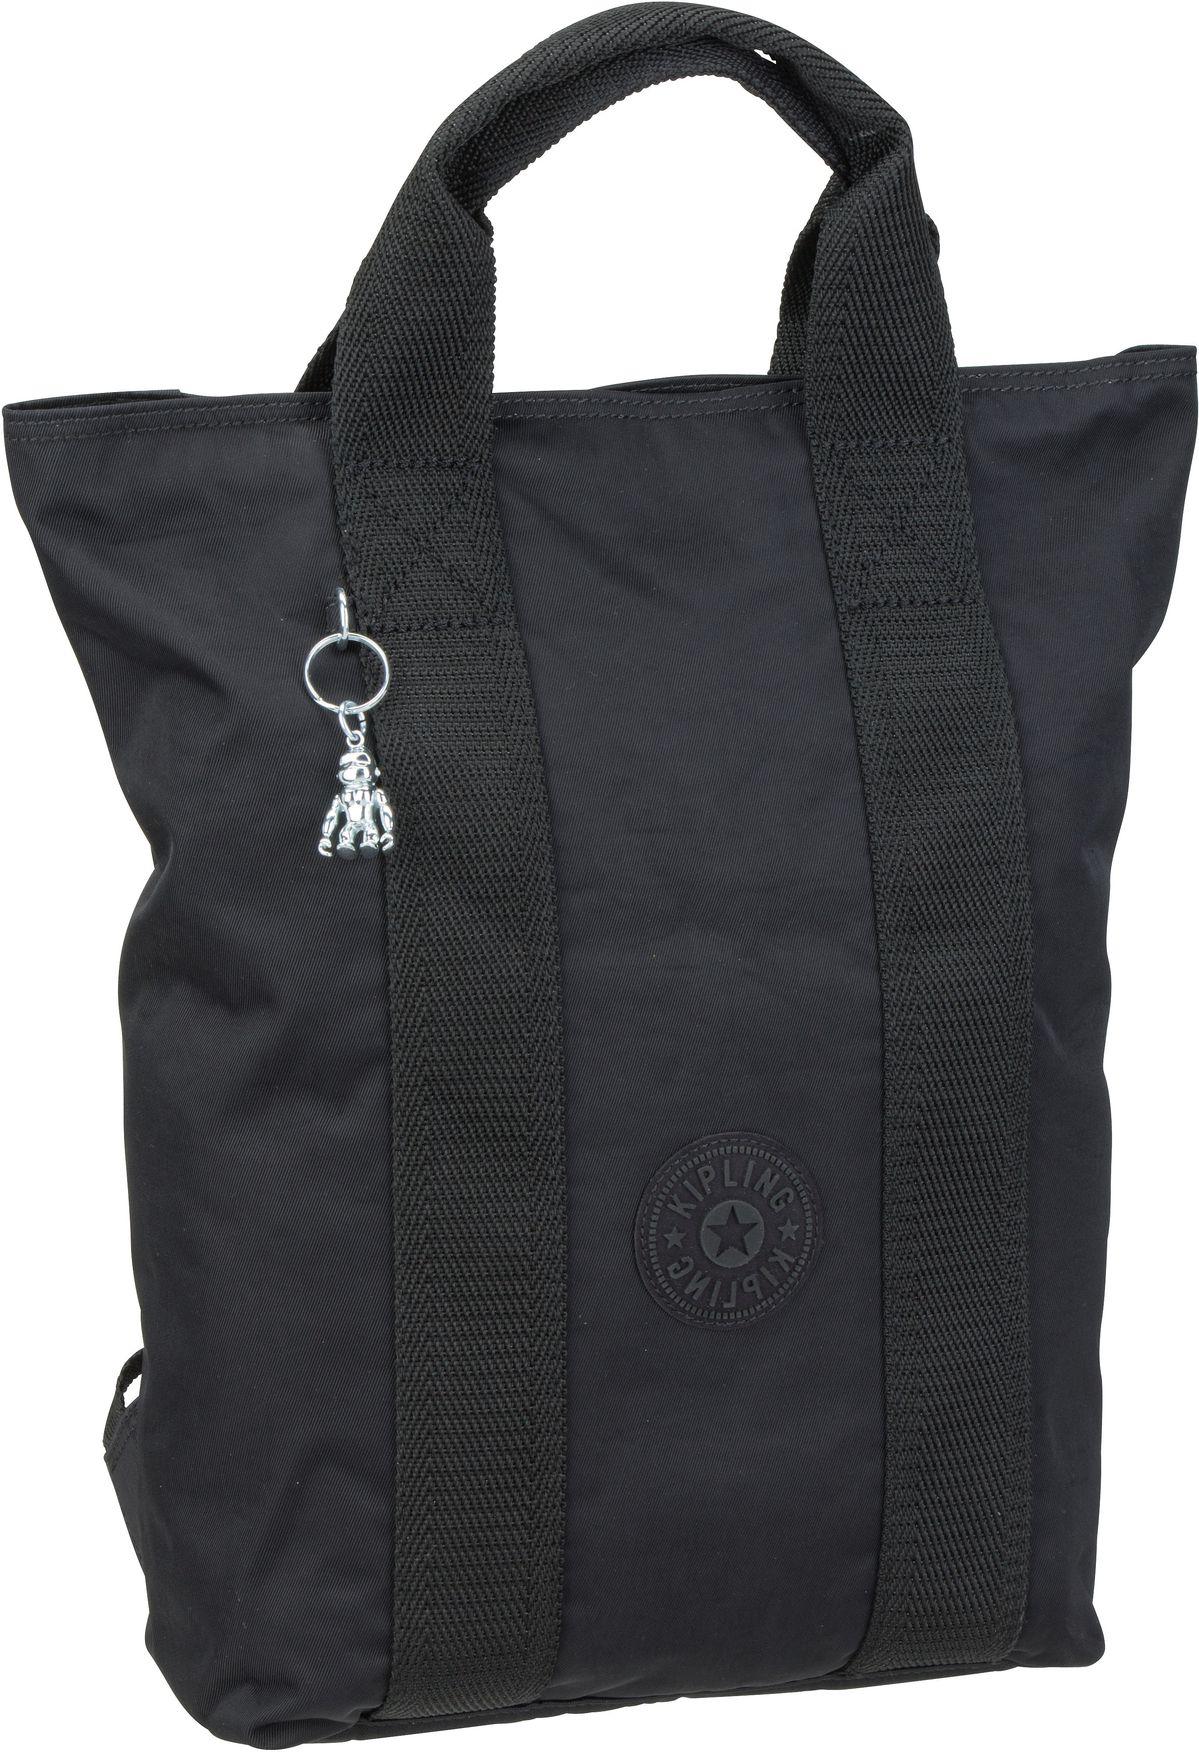 Rucksack / Daypack Dany Edgeland Rich Black (18 Liter)